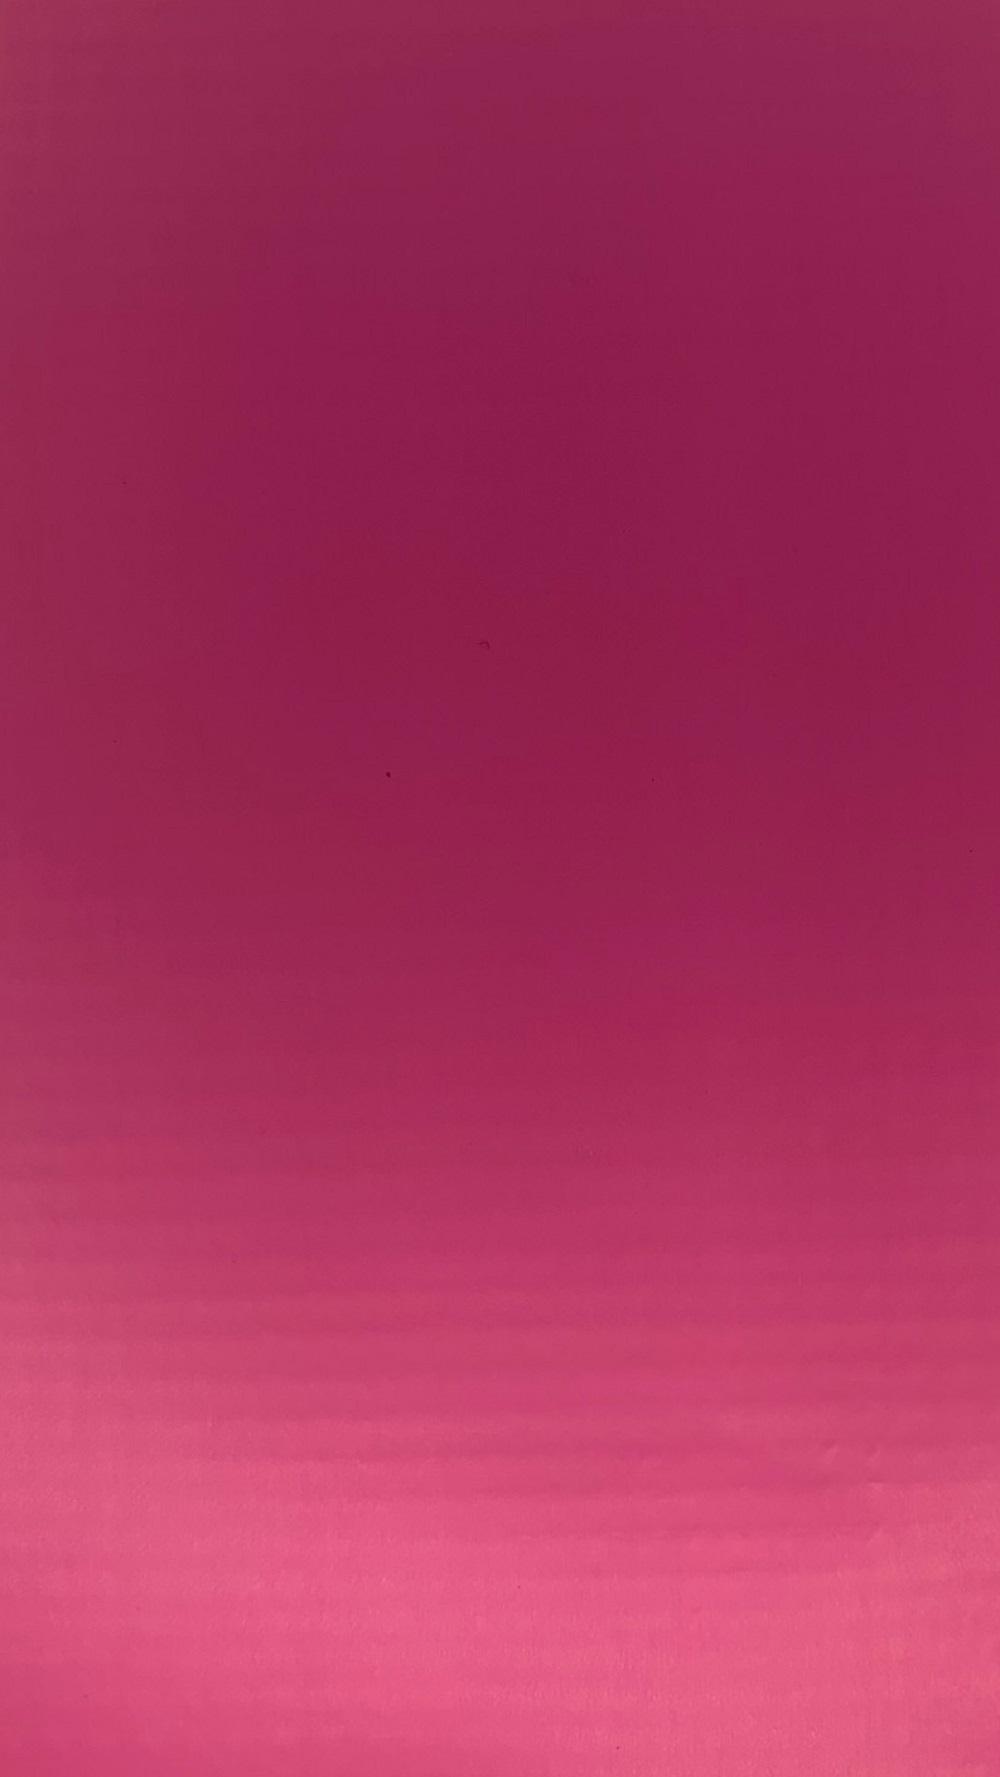 Lona Vinilona Df Fosca Rosa S-185 1,45mt X 50,0mts